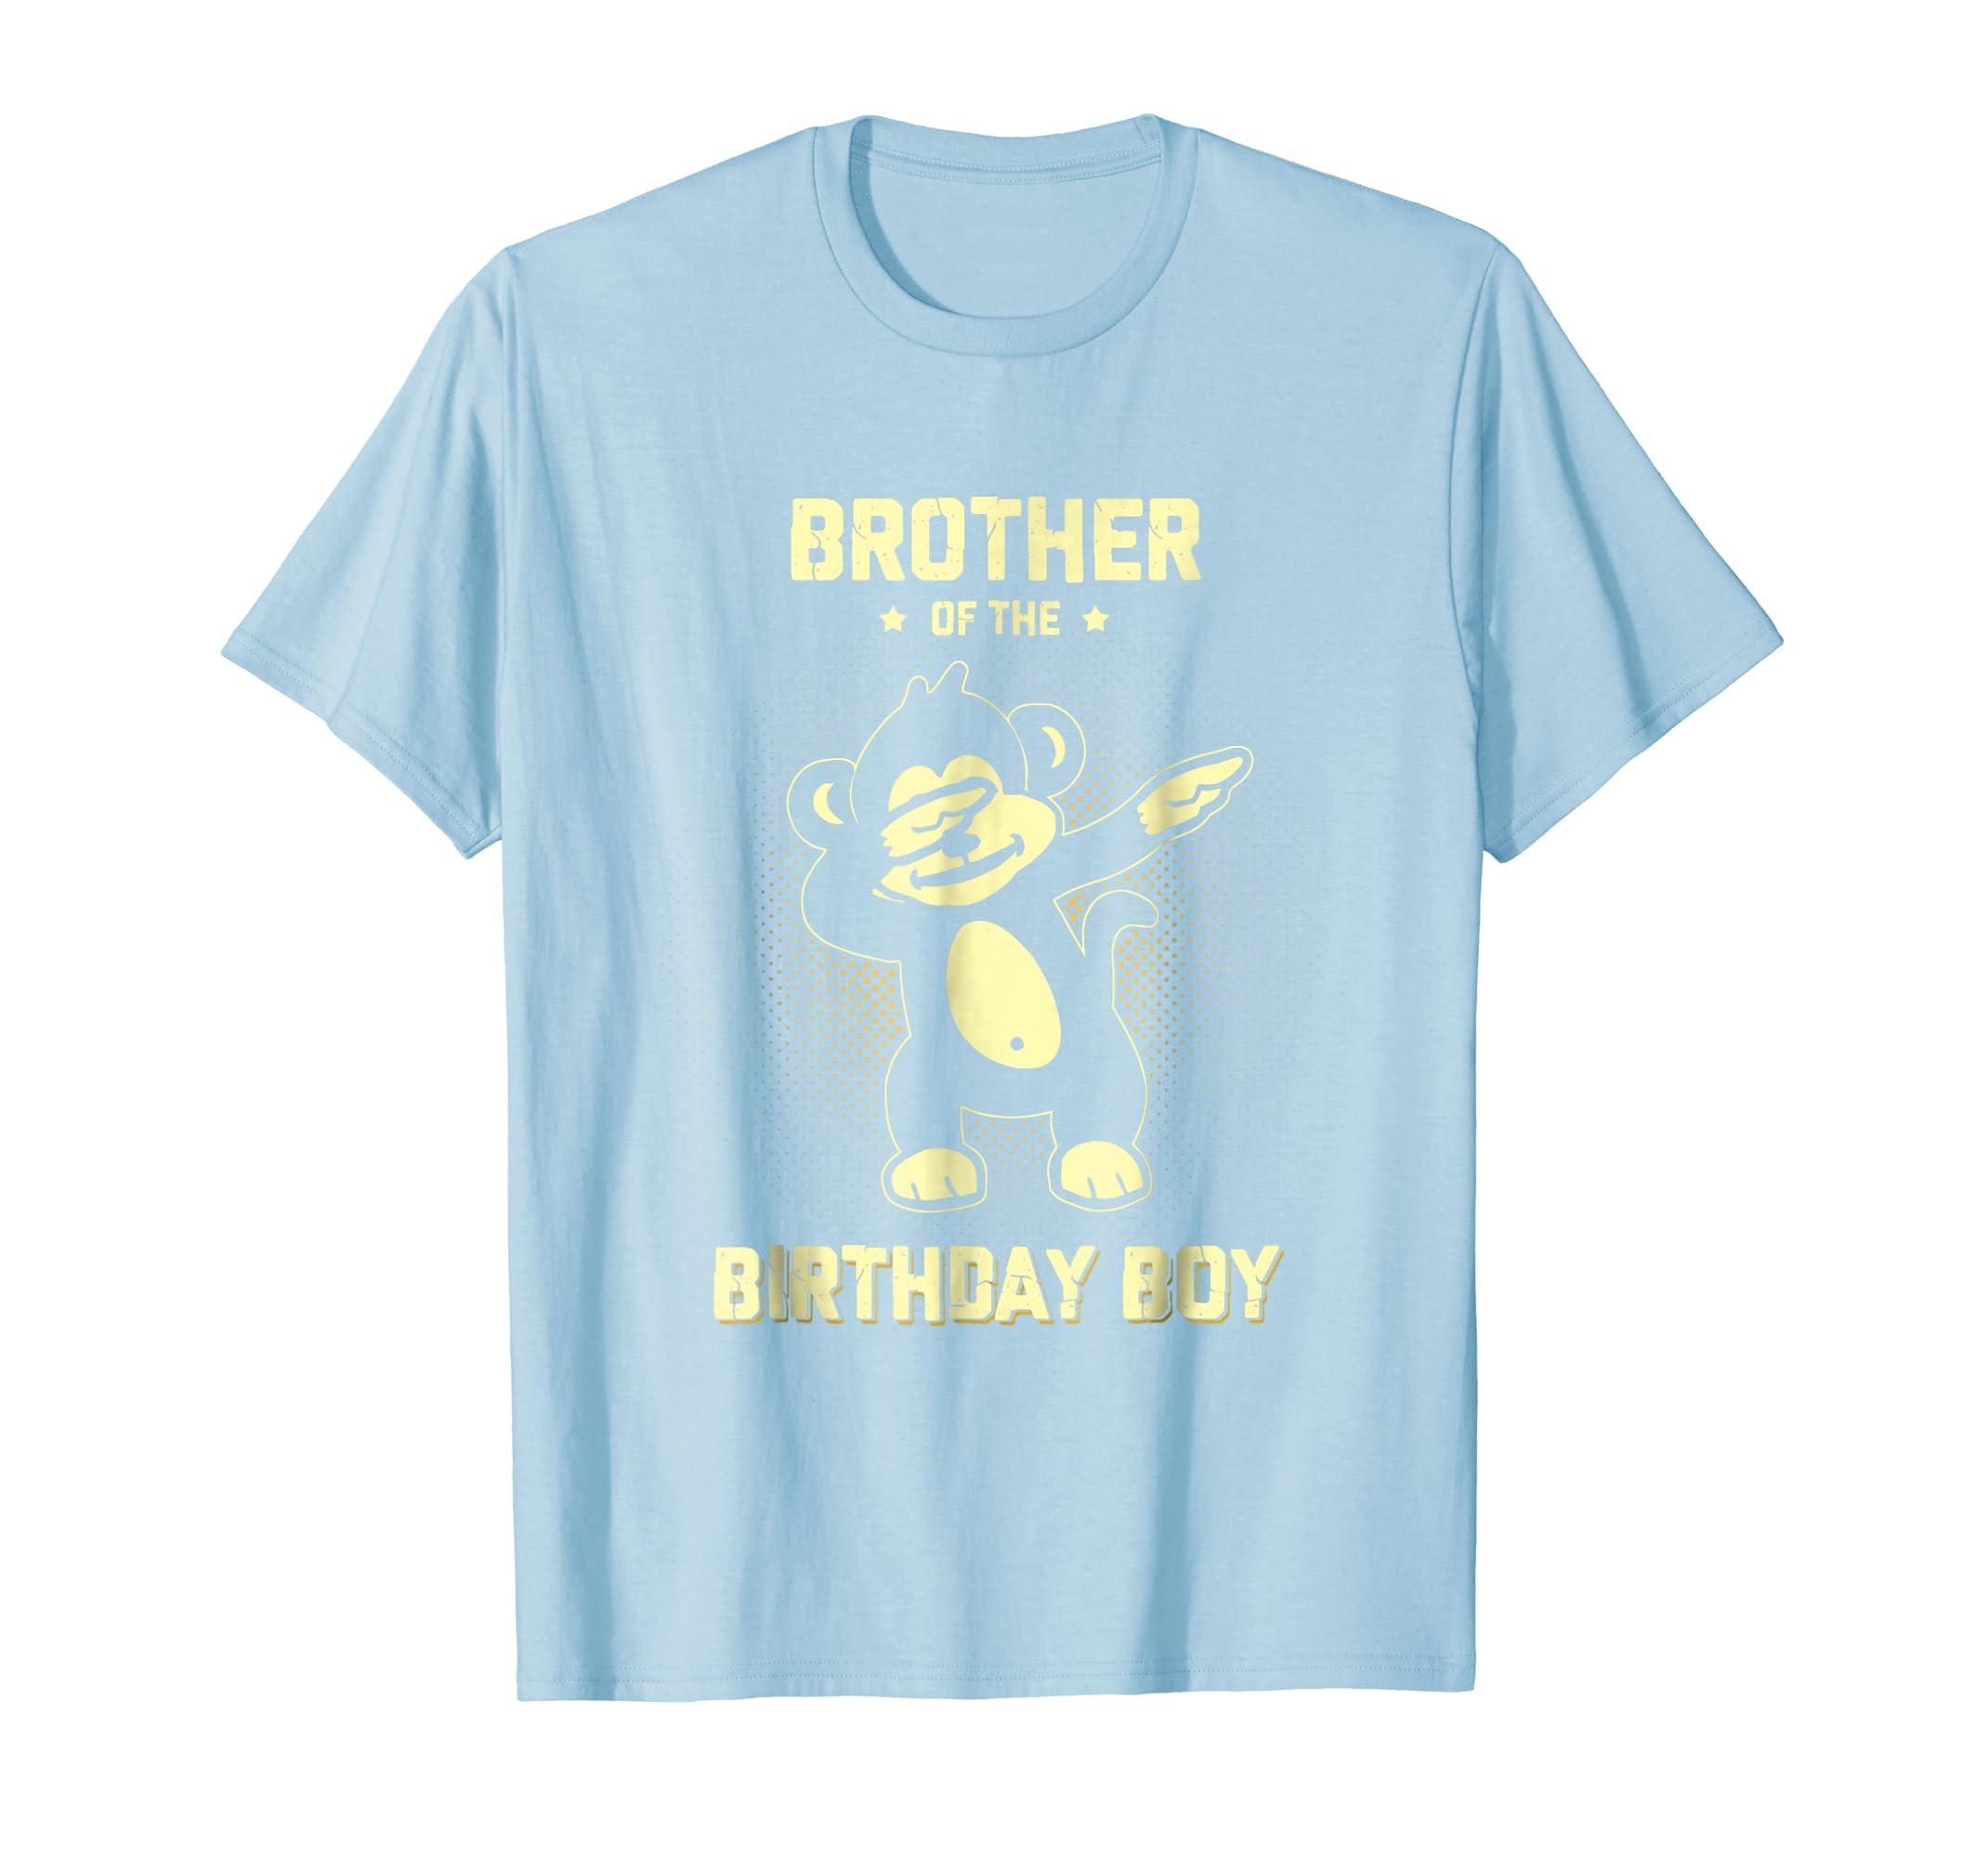 Amazon Brother Of The Monkey Birthday Boy Shirt Funny Dab Dance Clothing